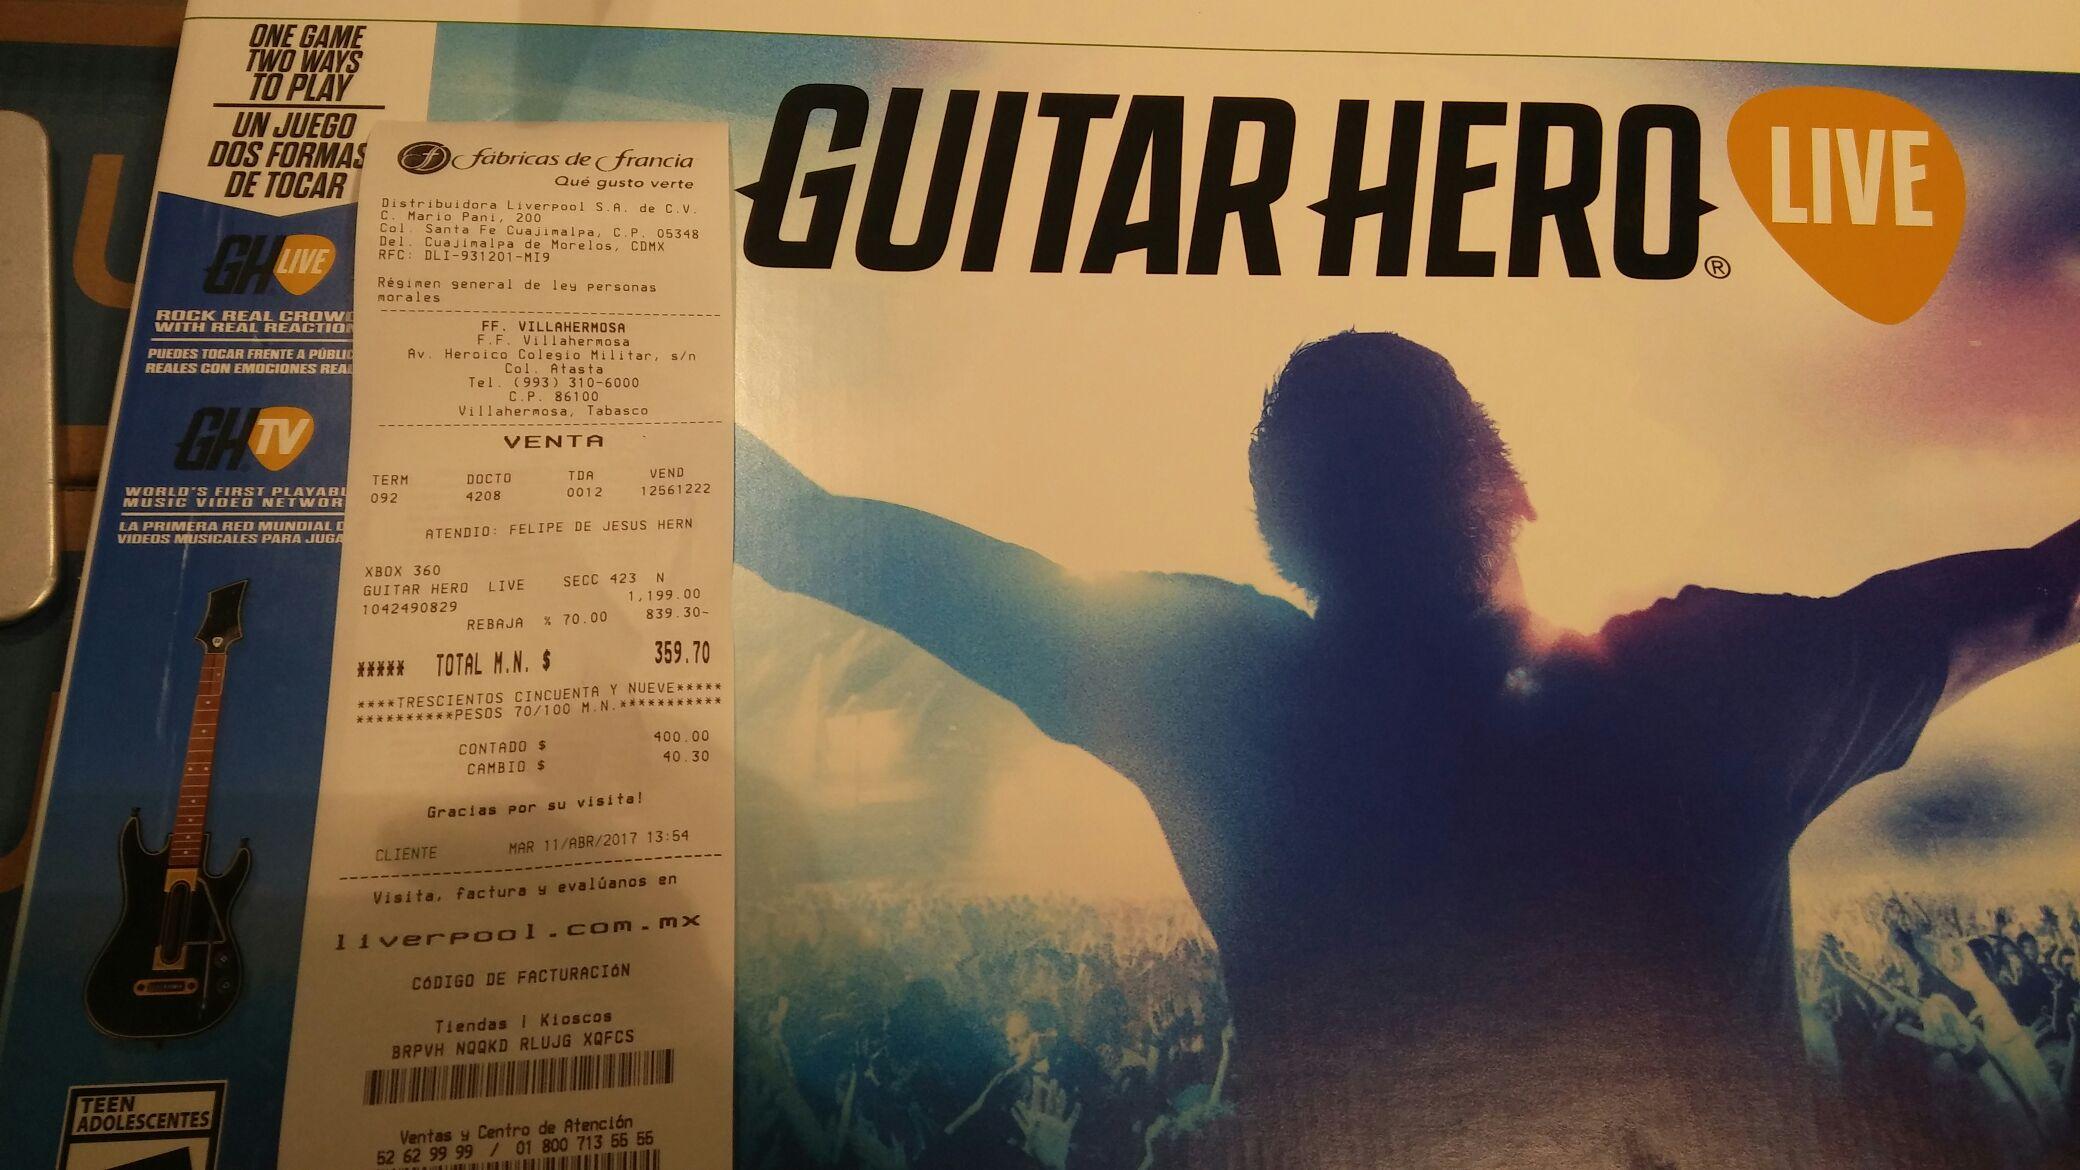 Fábricas de Francia: Guitar hero xbox 360